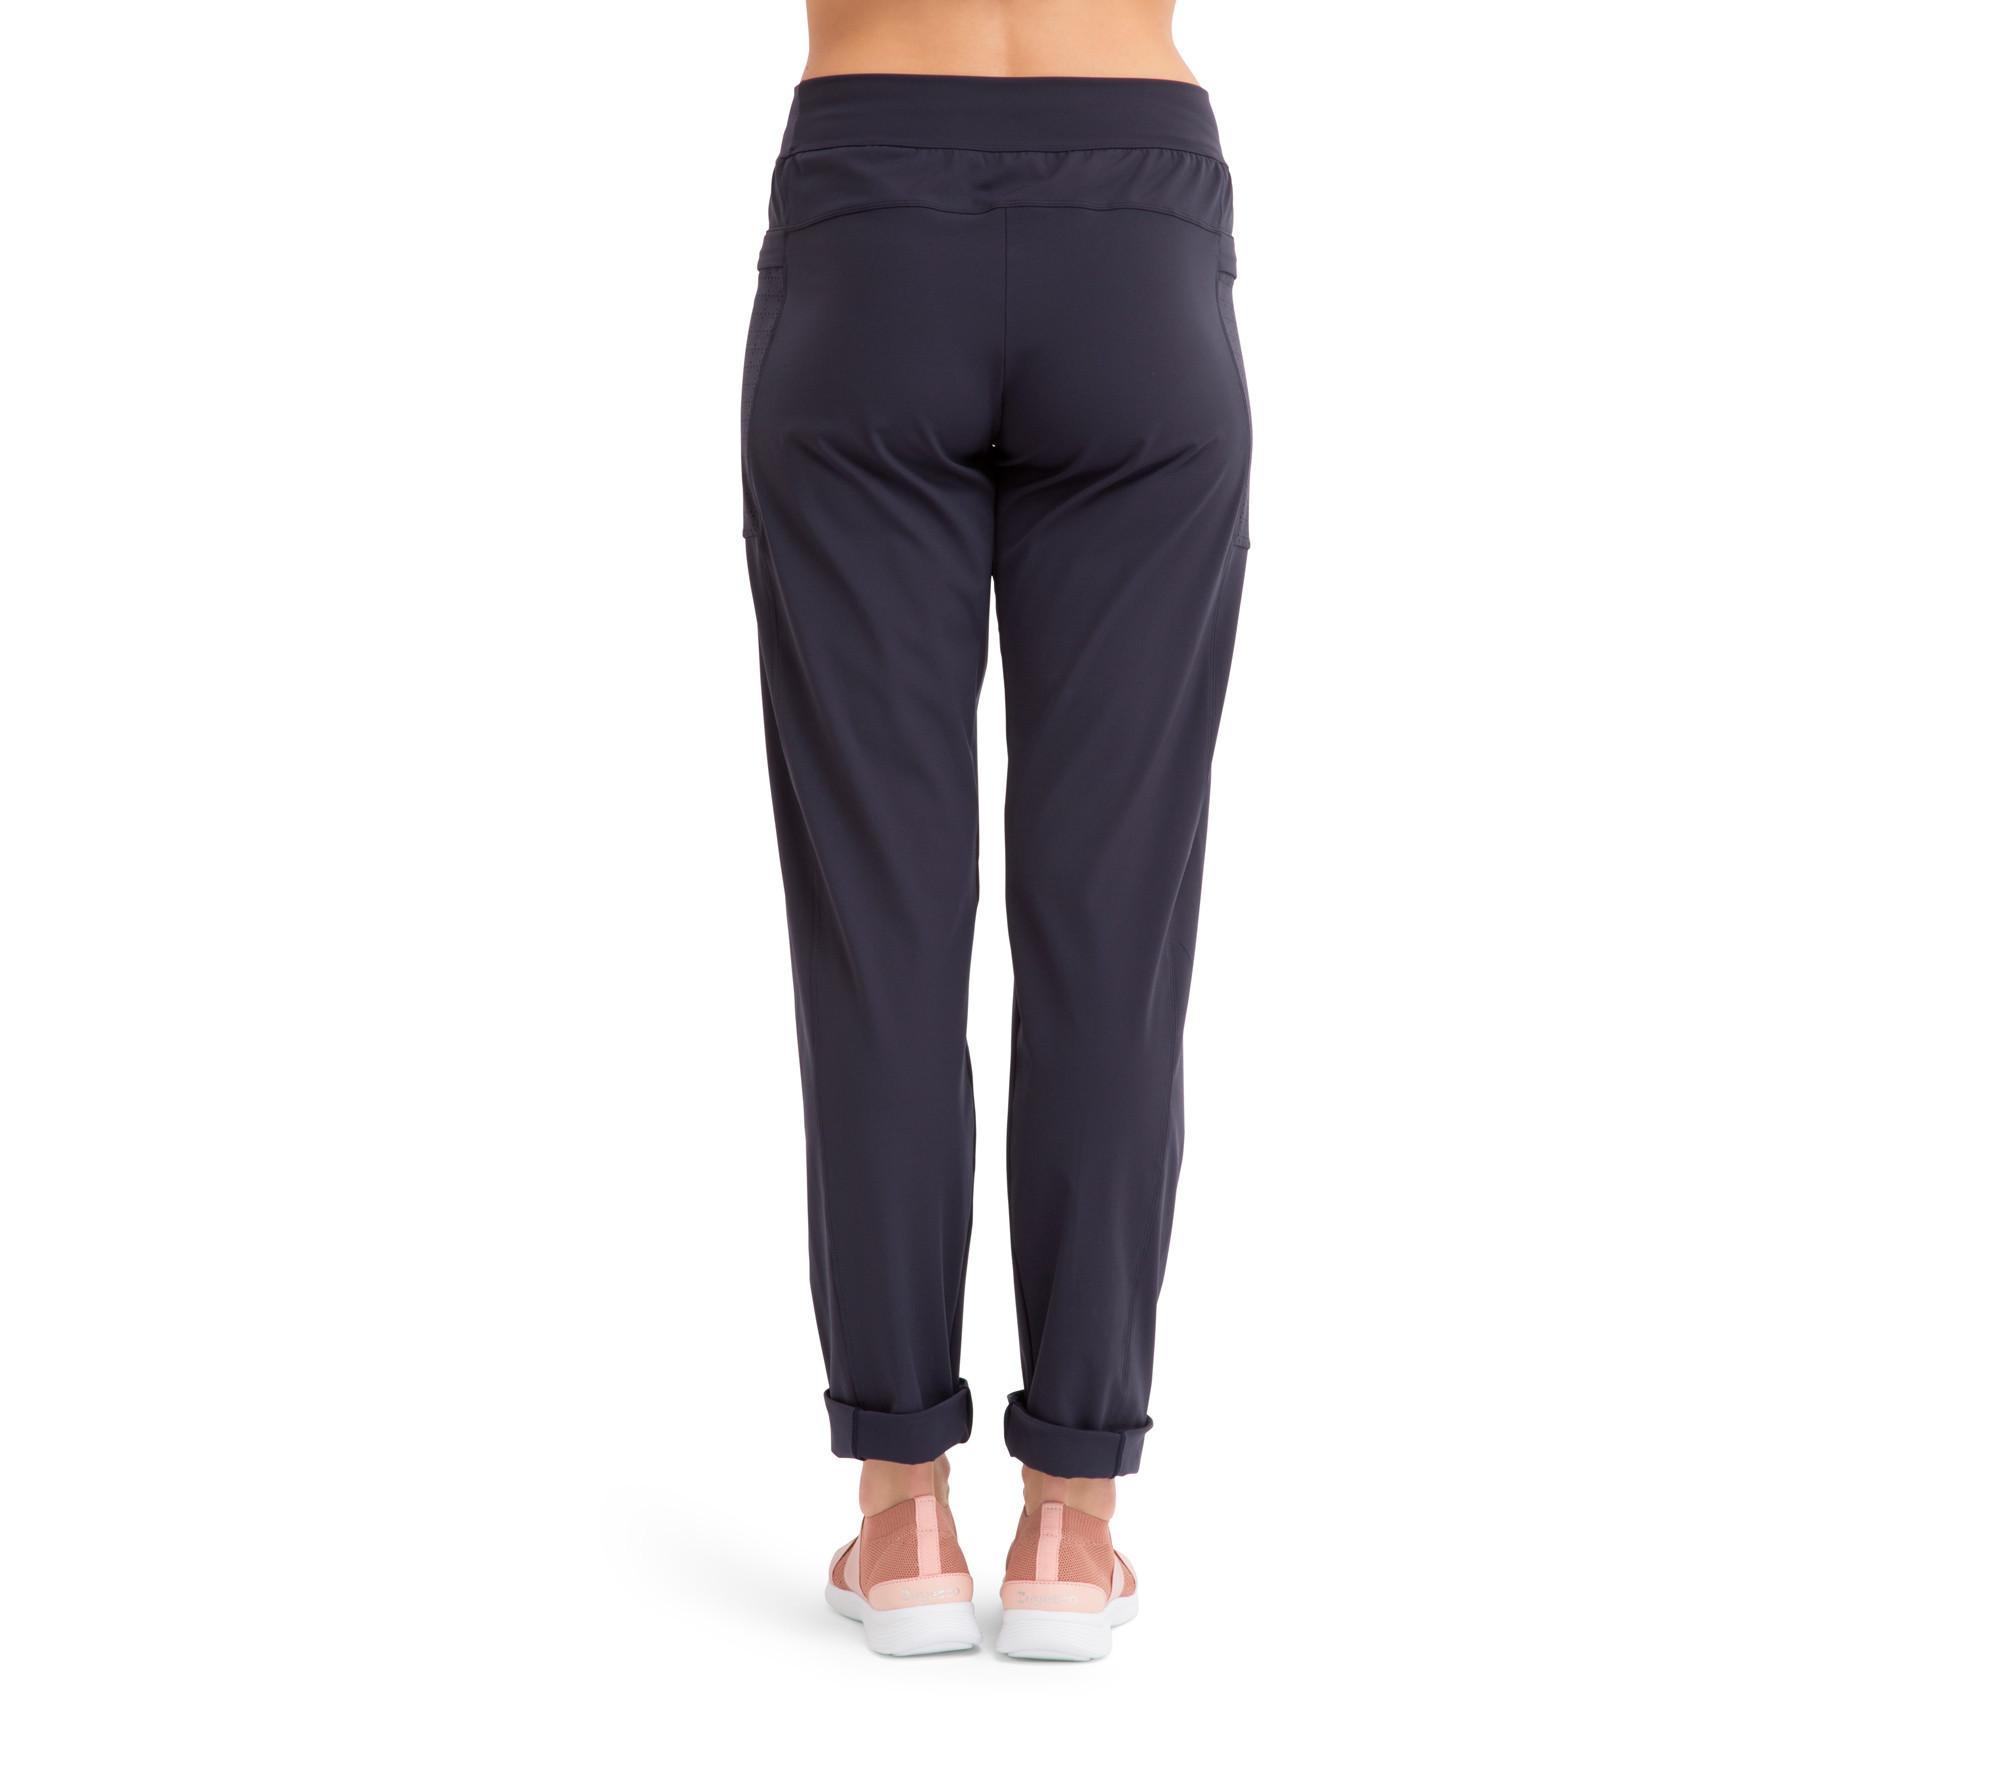 High stretch technical pants